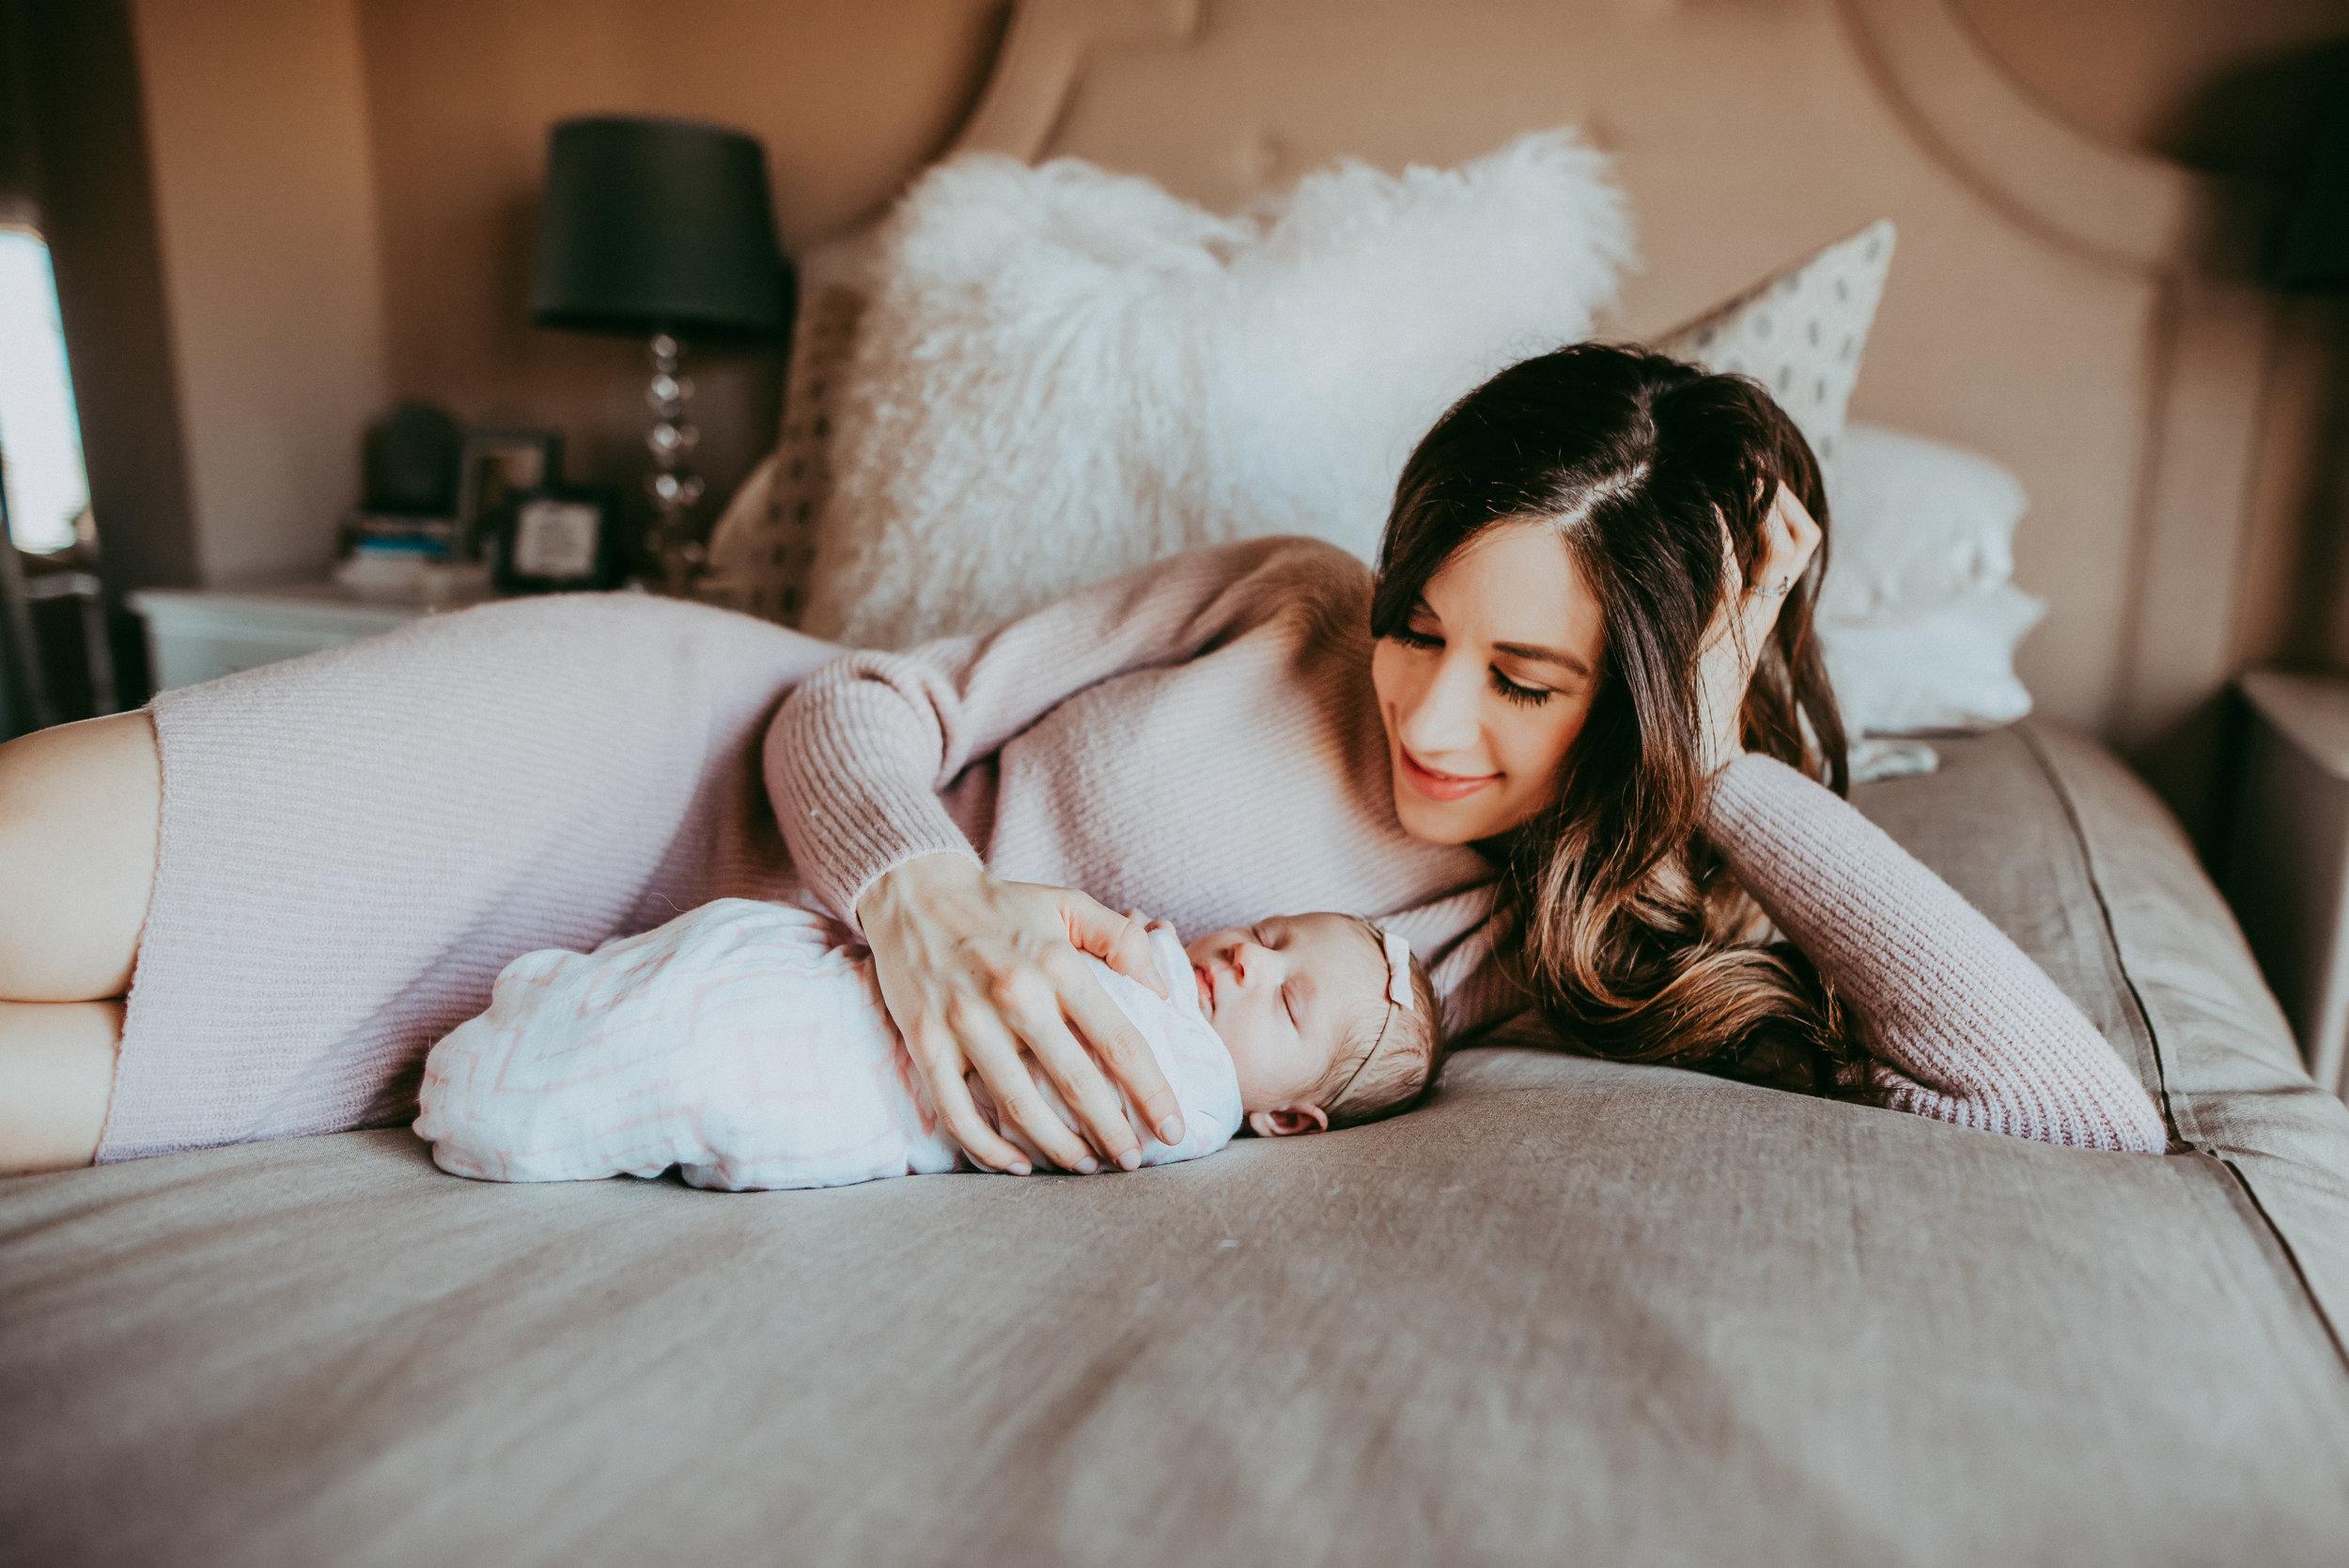 BabyCharlotte_StoriedPhotography-83.jpg